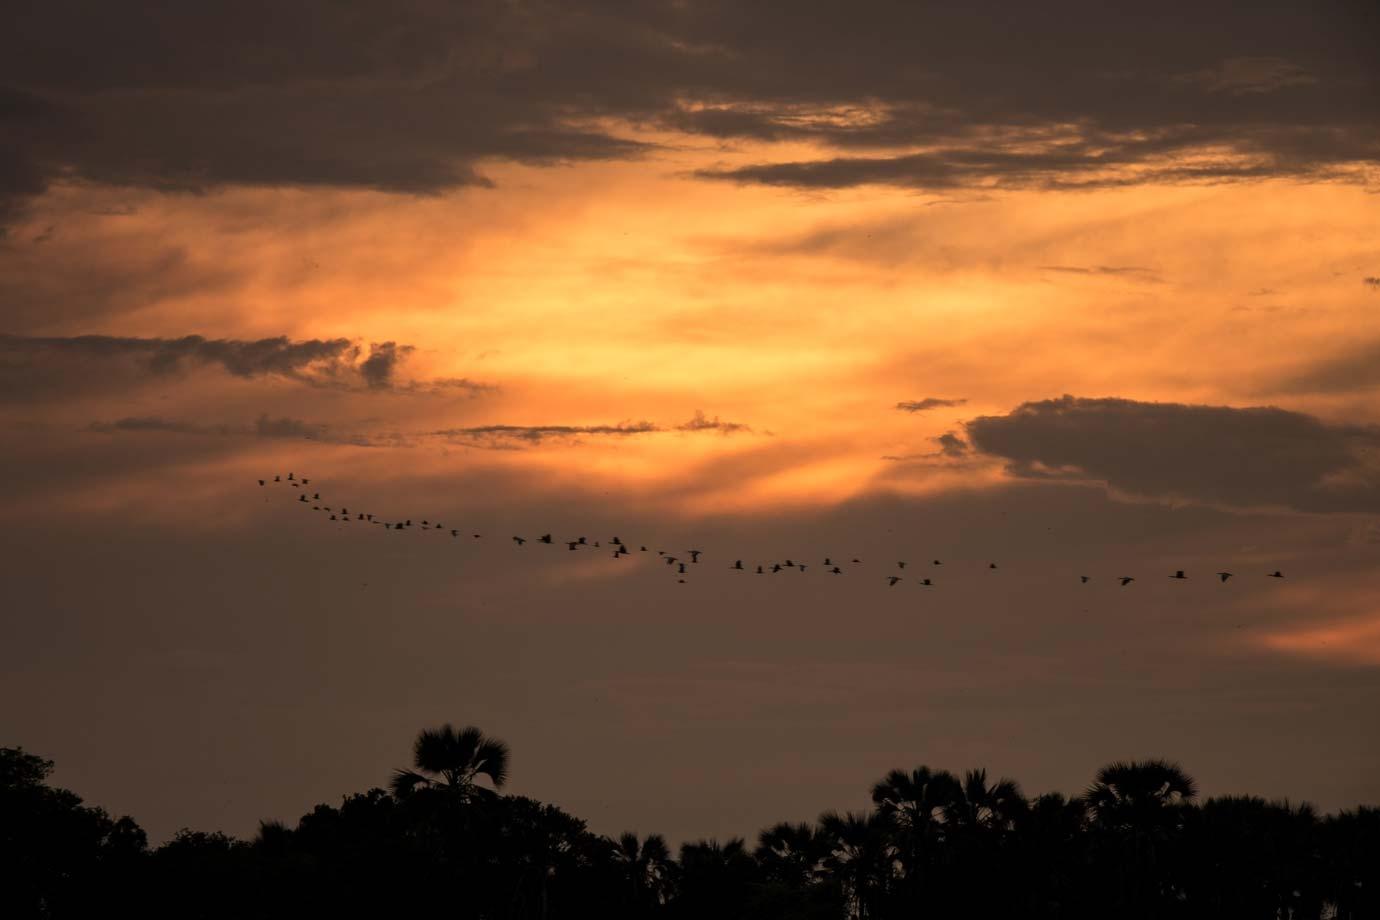 Sonnenuntergang in Simbabwe